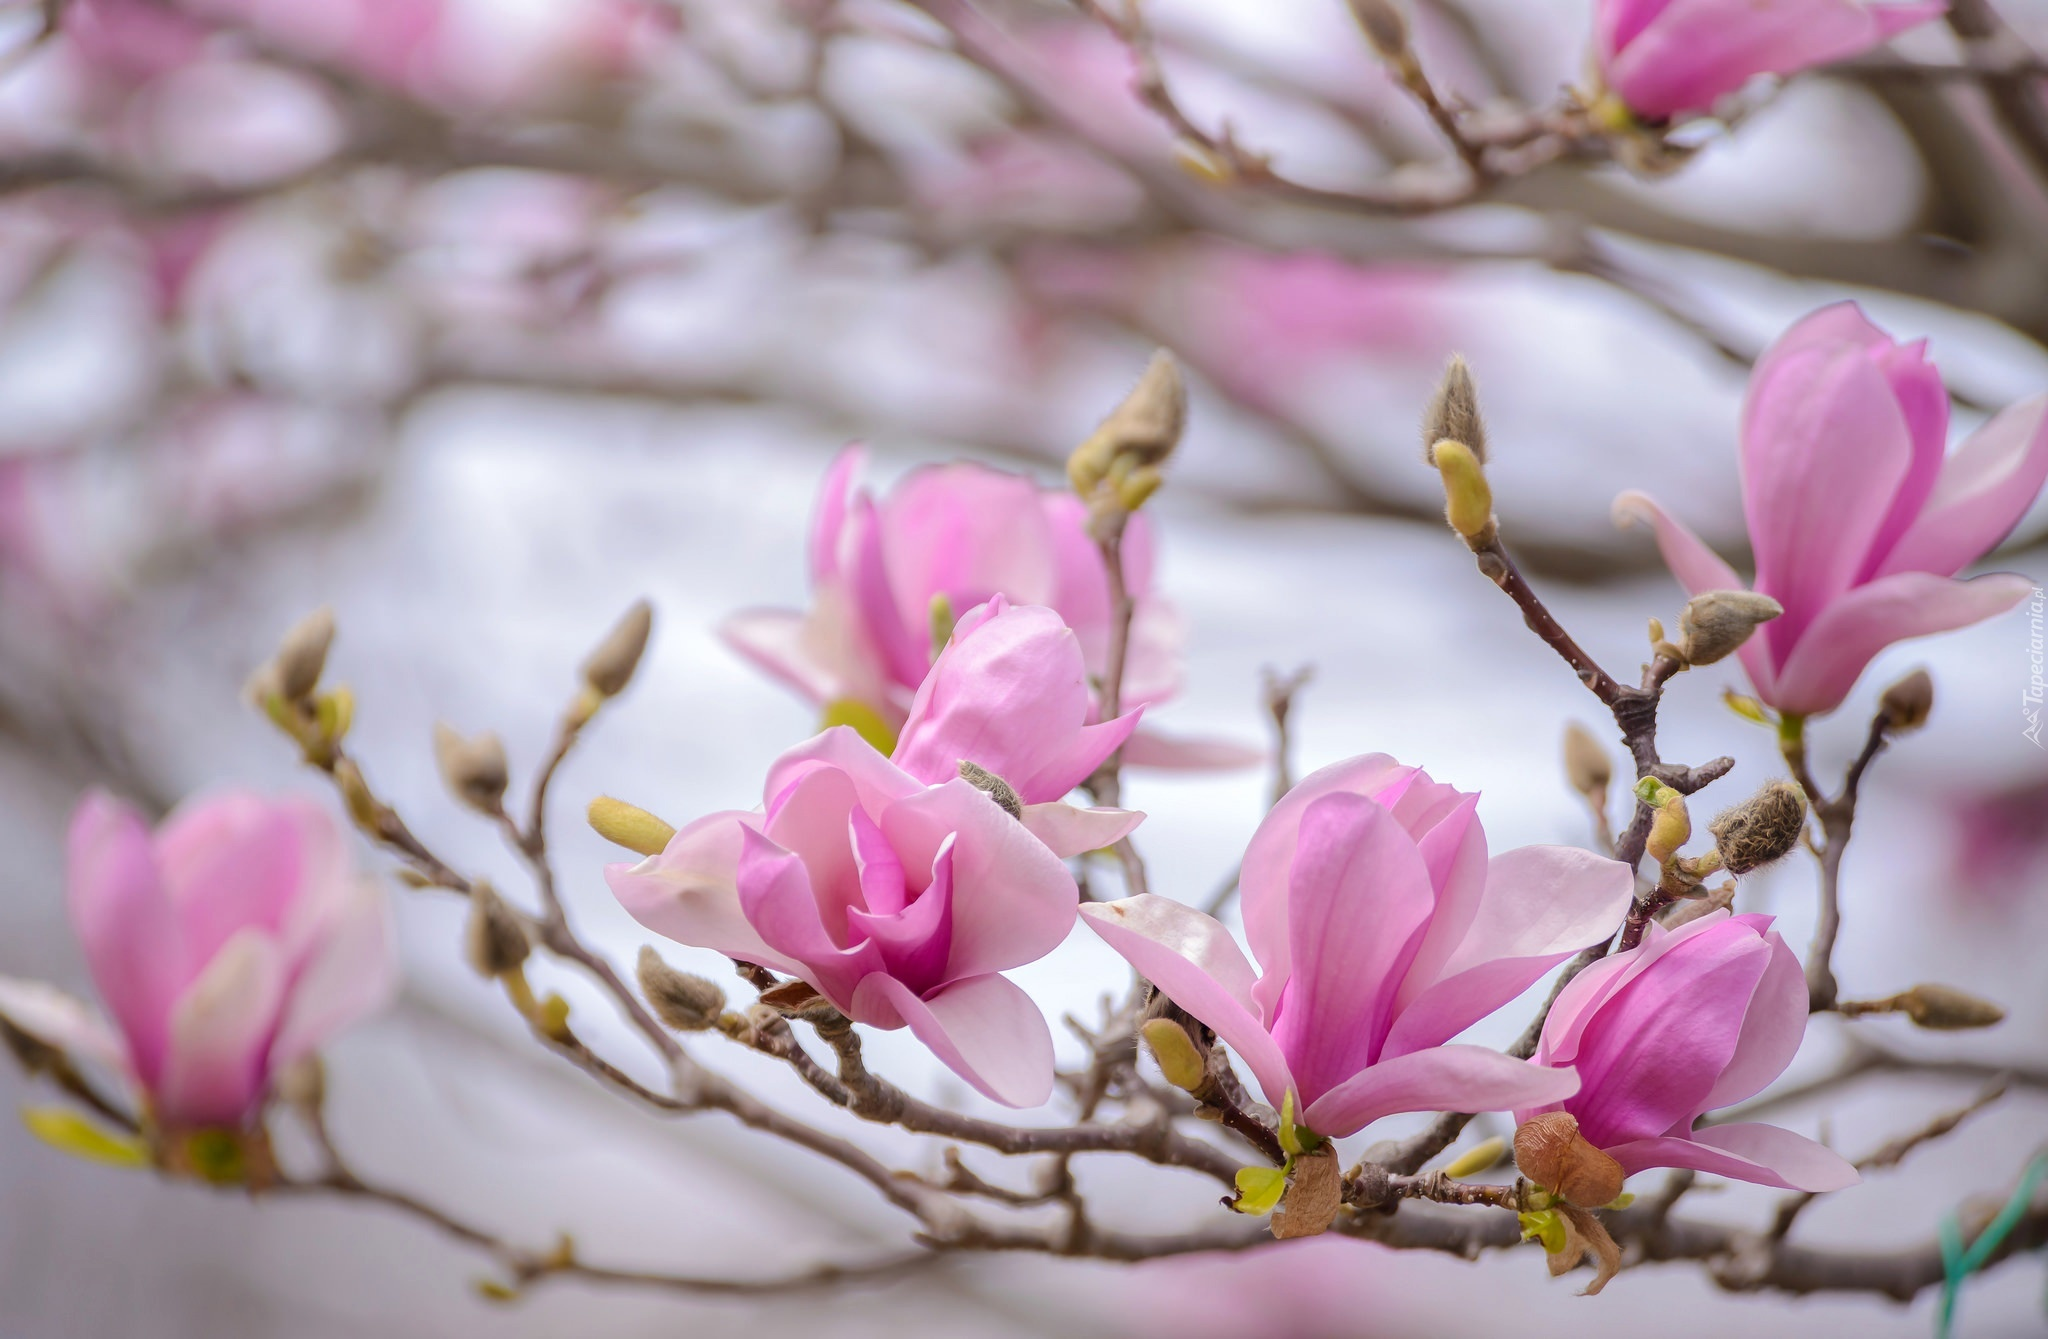 Gałązka wiosennych magnolii